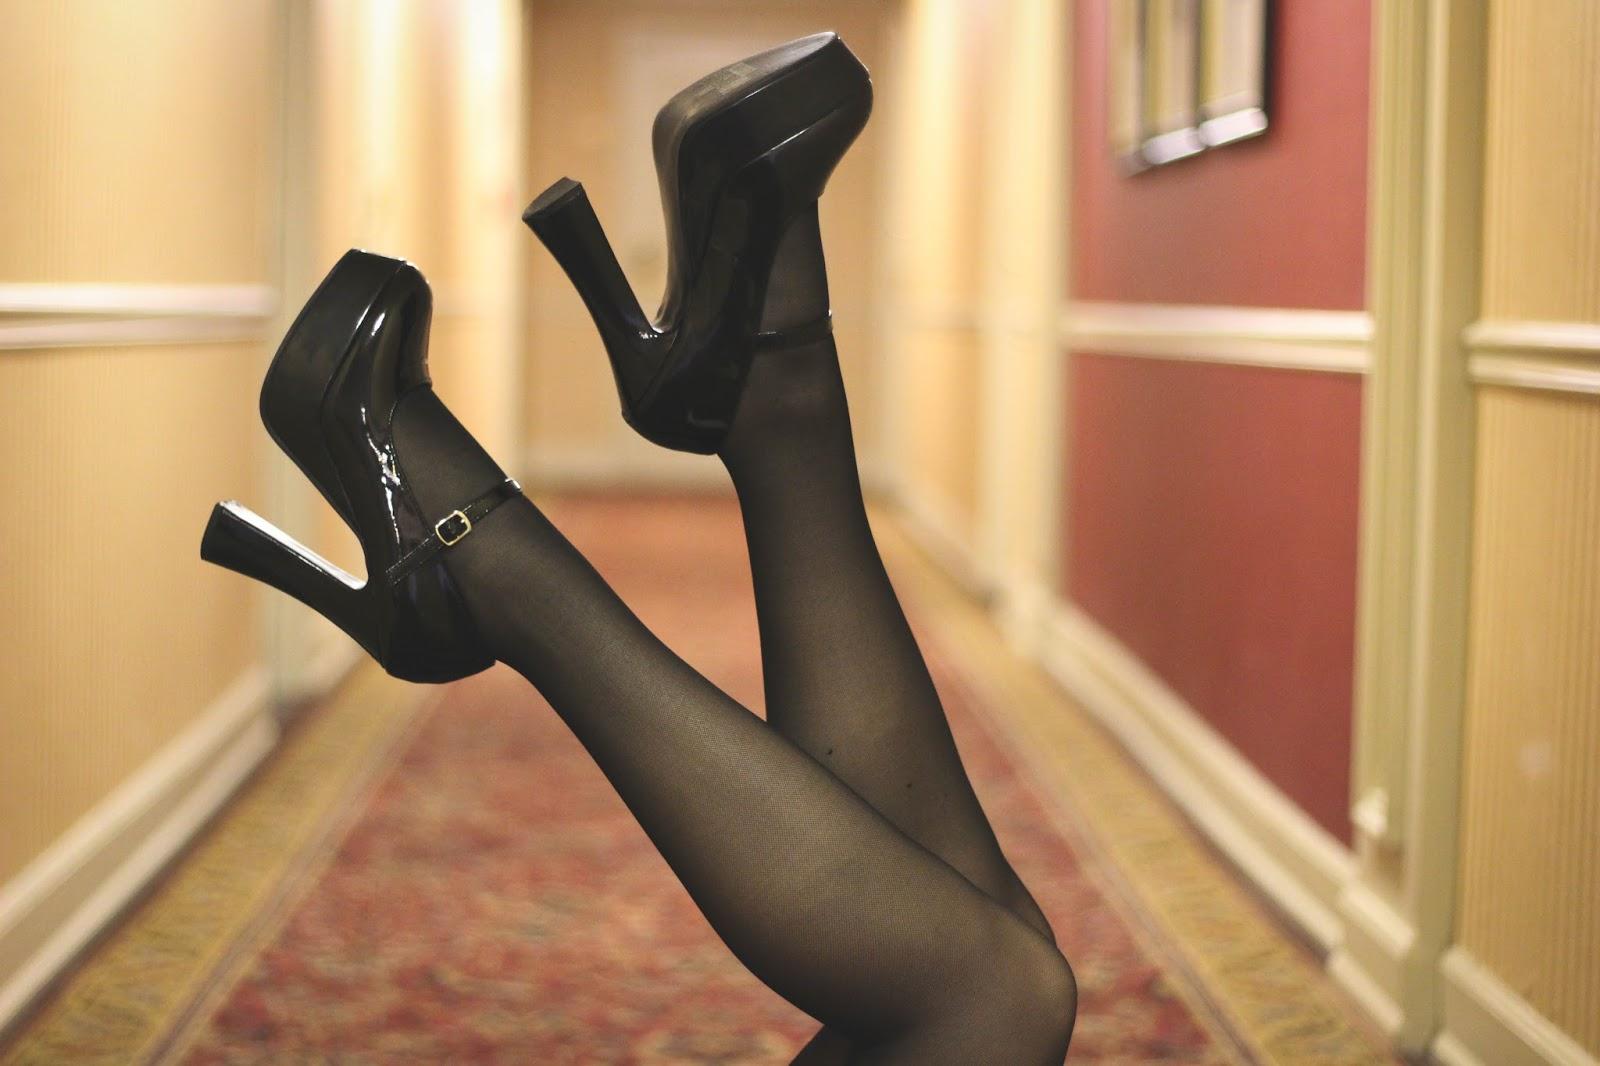 Retro 60's Inspired, Platform Heels Ankle Strap